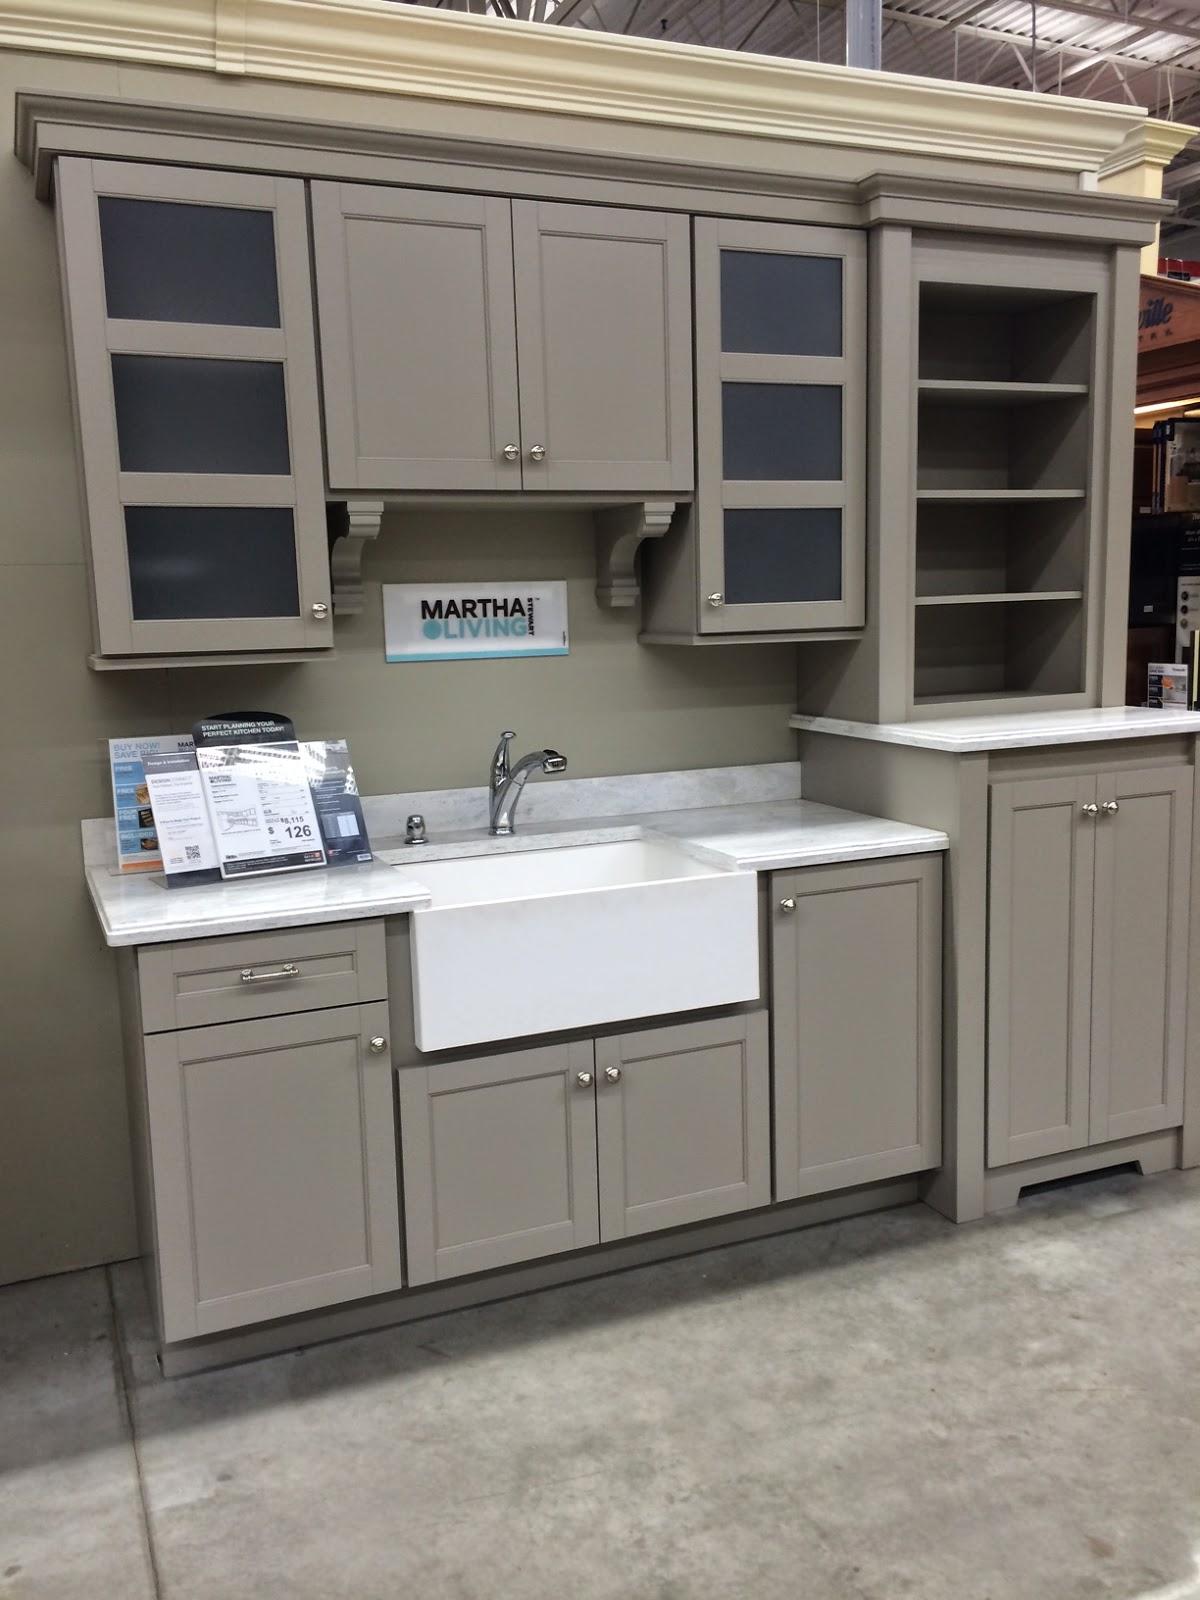 kitchen remodel with martha stewart home depot kitchen cabinets Kitchen Remodel with Martha Stewart Cabinets